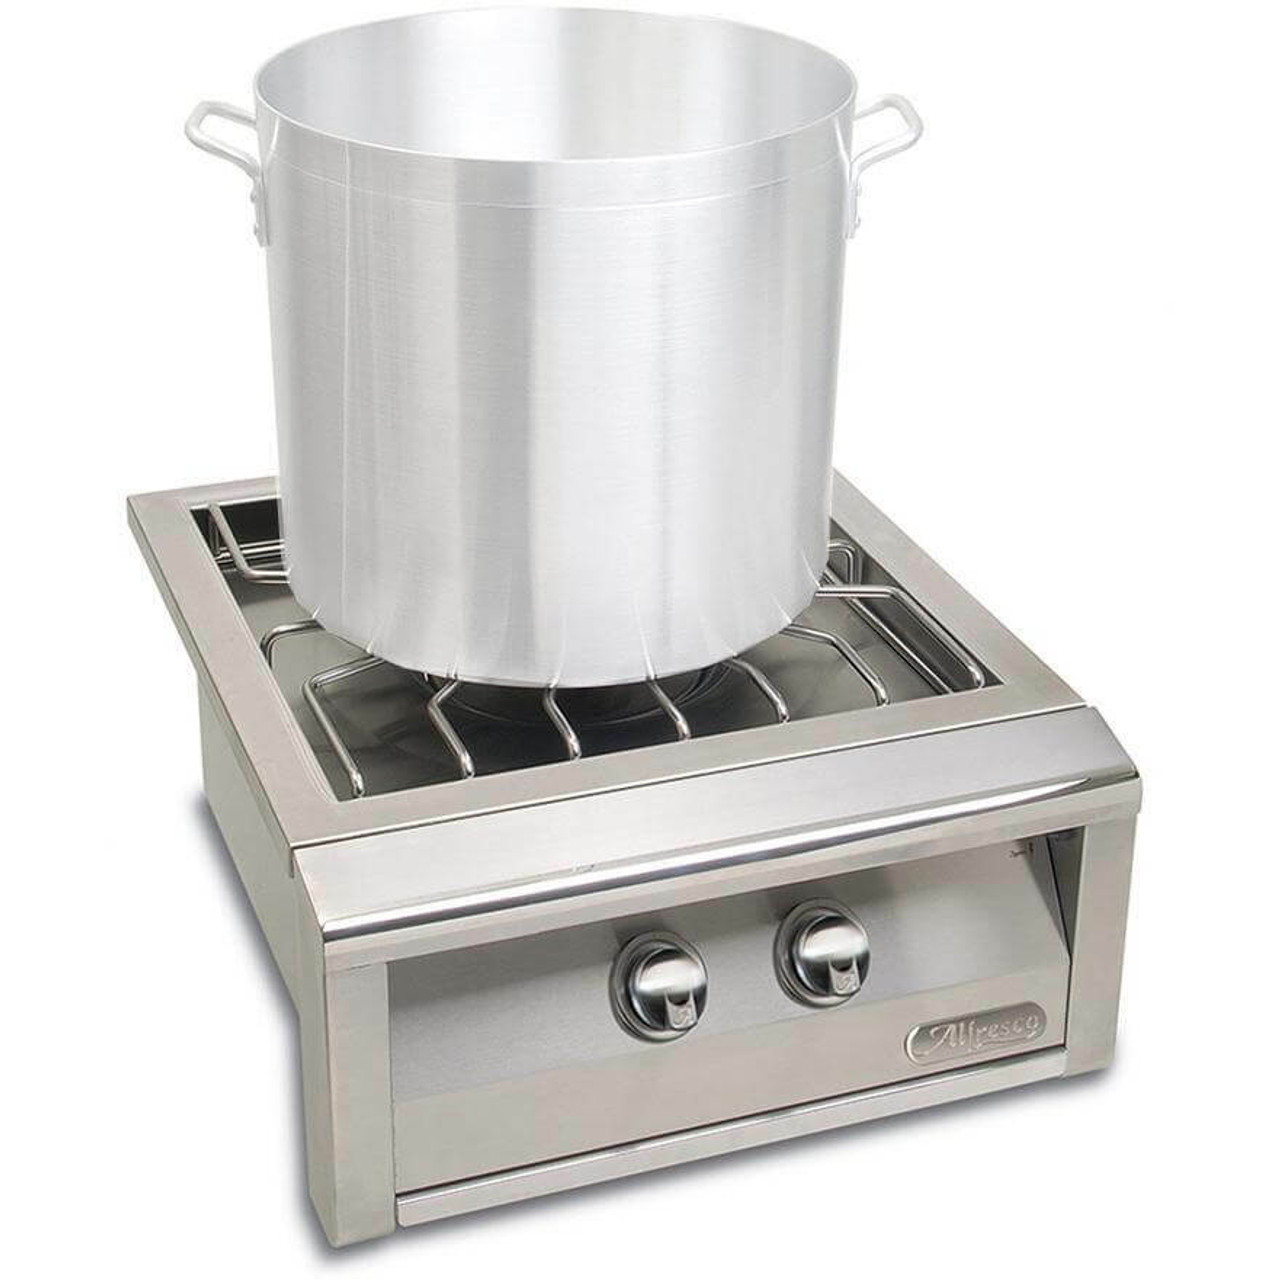 Alfresco 24 Inch Versa Power Cooking System